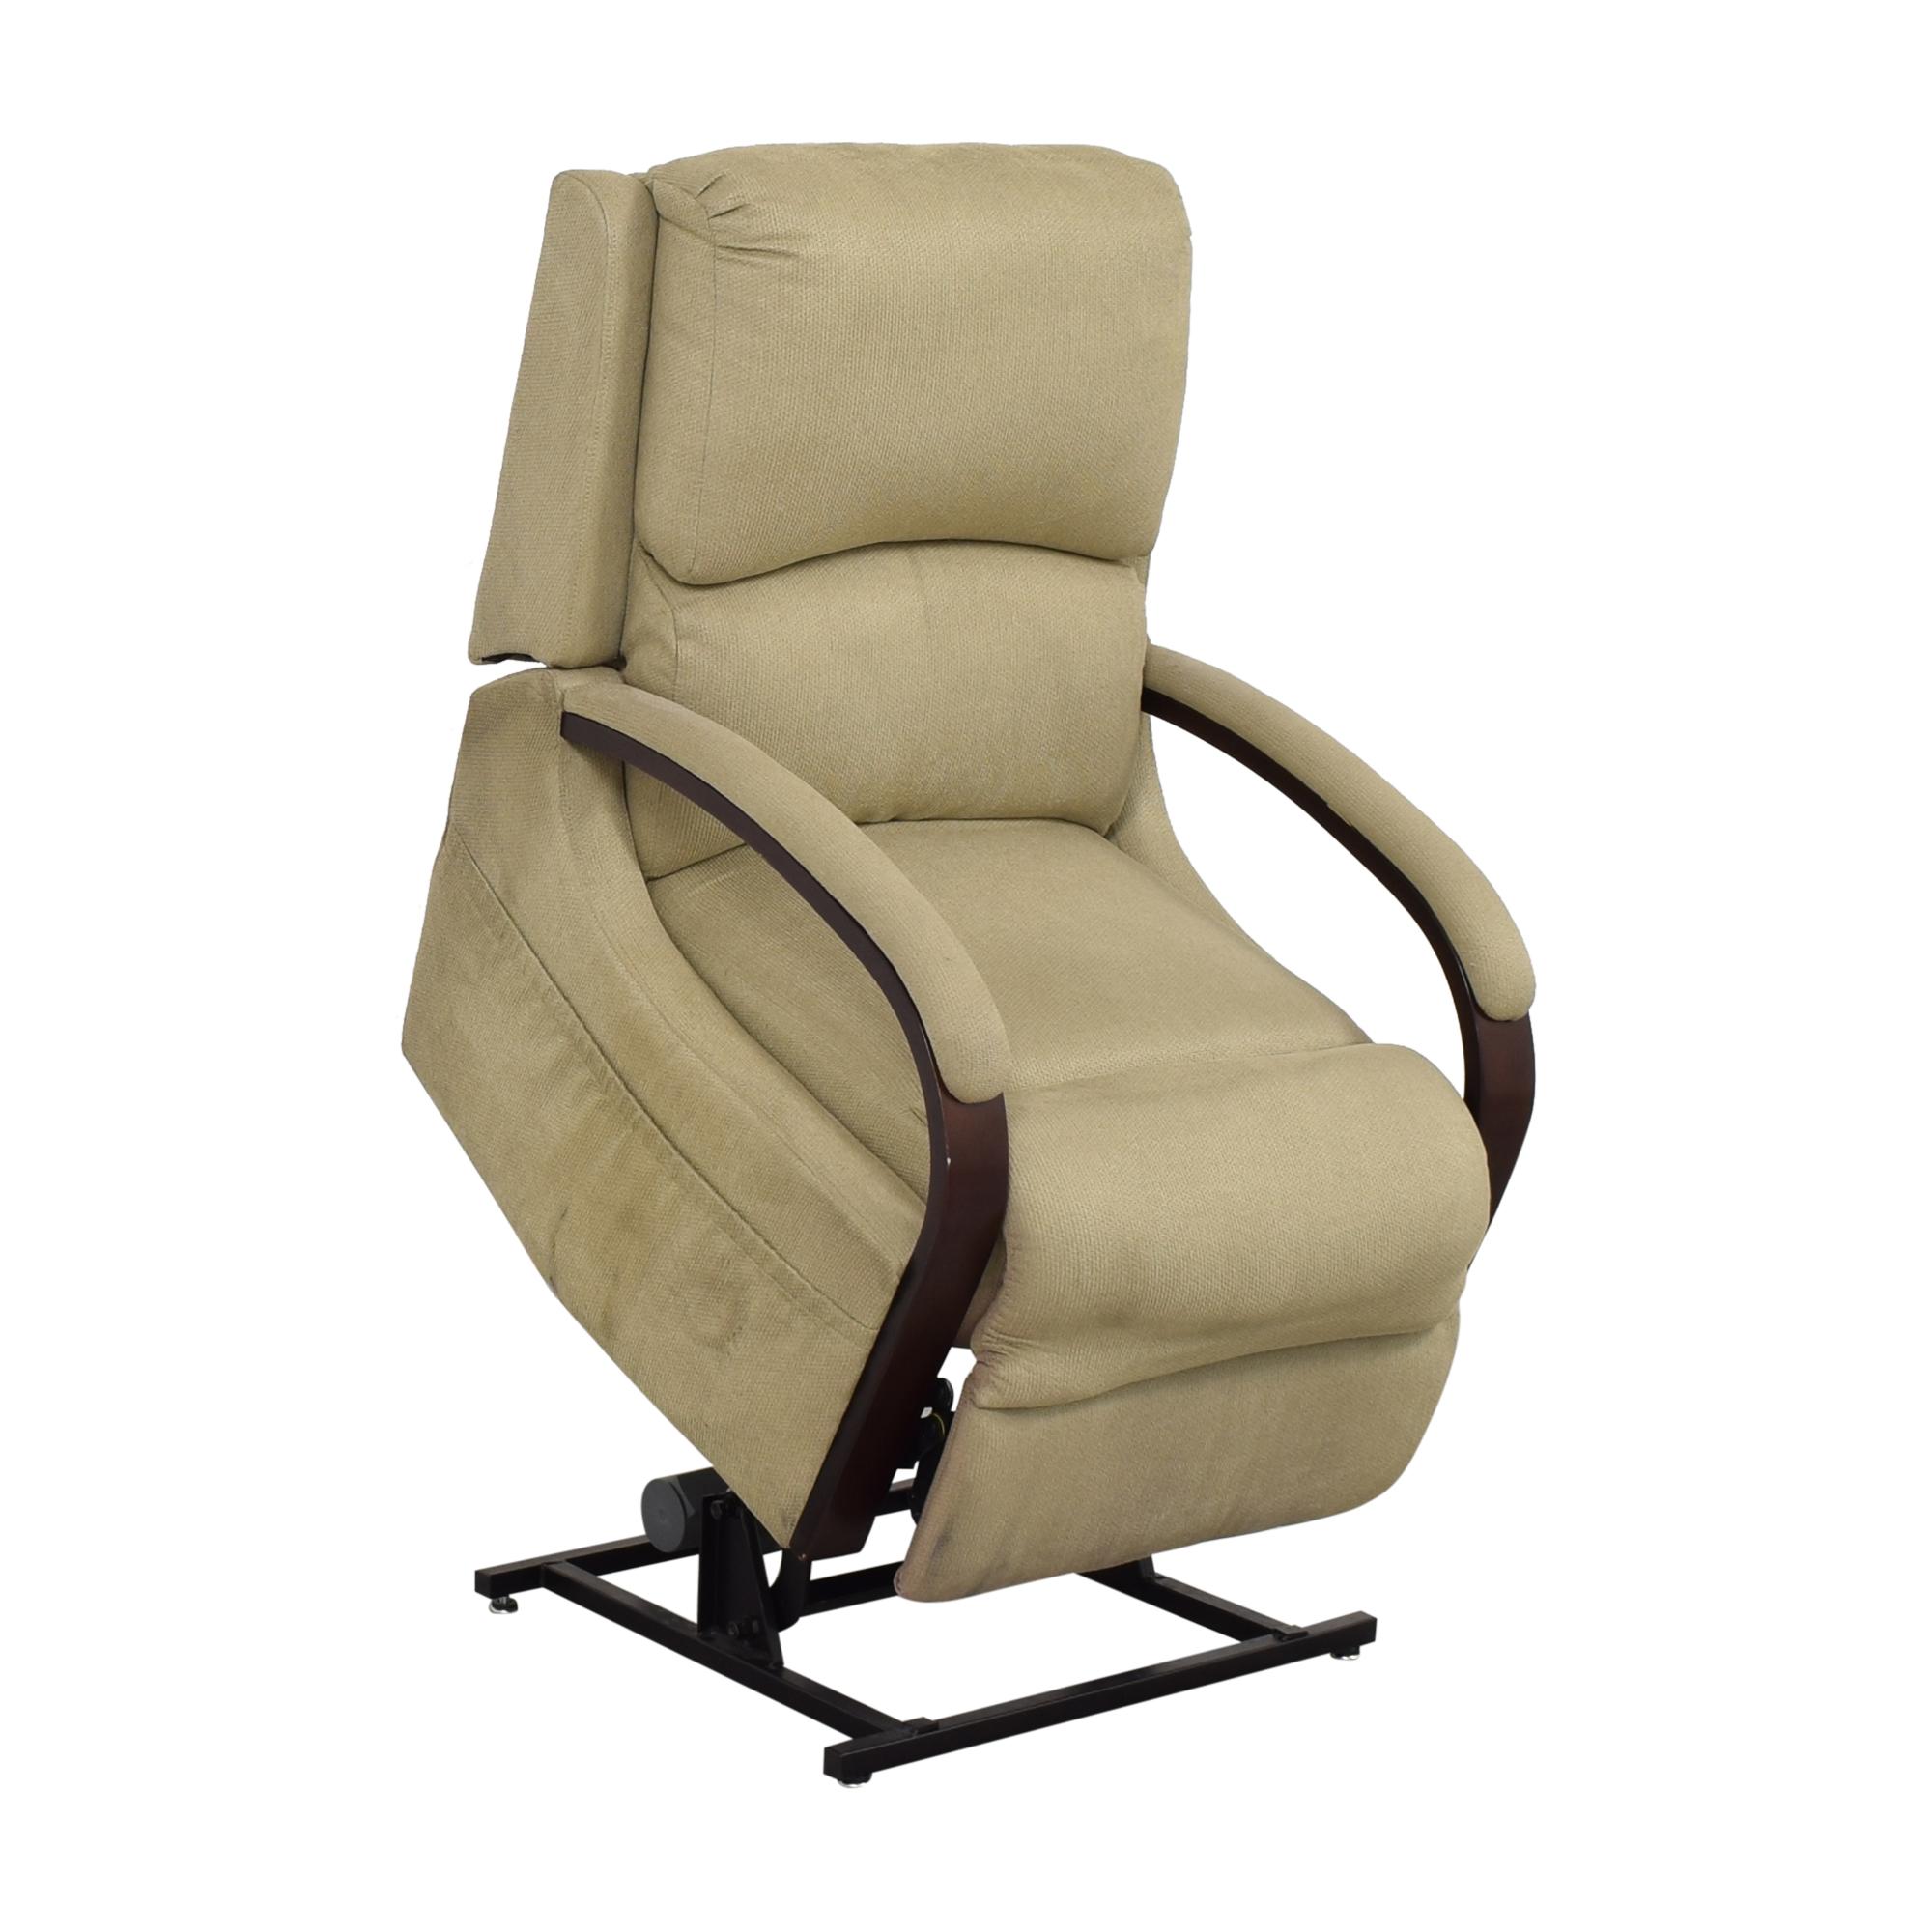 buy Macy's Power Lift Recliner Chair Macy's Chairs